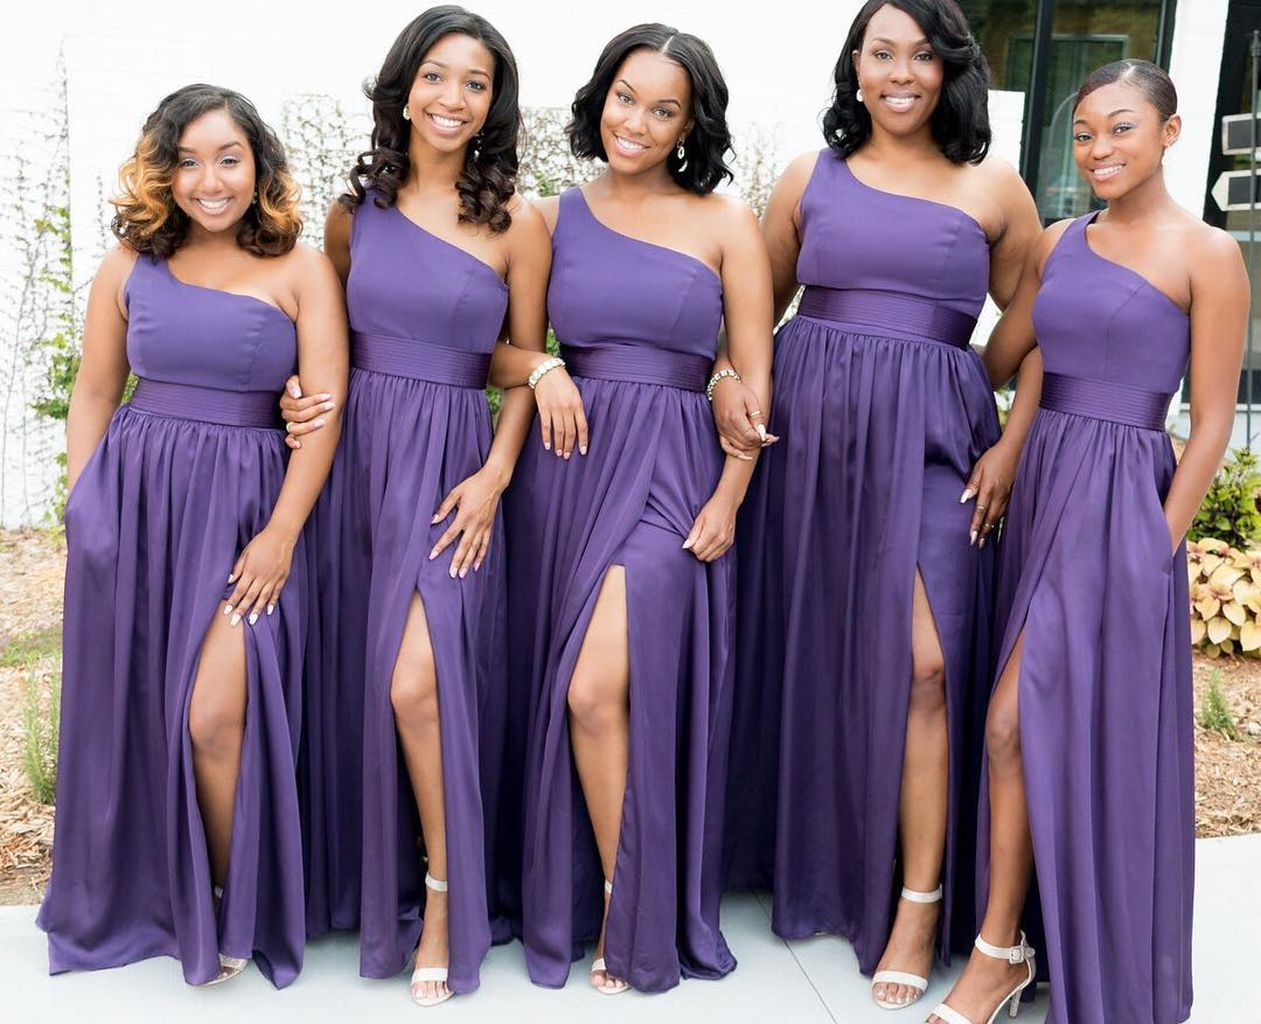 75 Stunning African American Wedding Hairstyle Ideas For Memorable Wedding Vis Wed Bridesmaid Dress Colors Cheap Bridesmaid Dresses Purple Bridesmaid Dresses